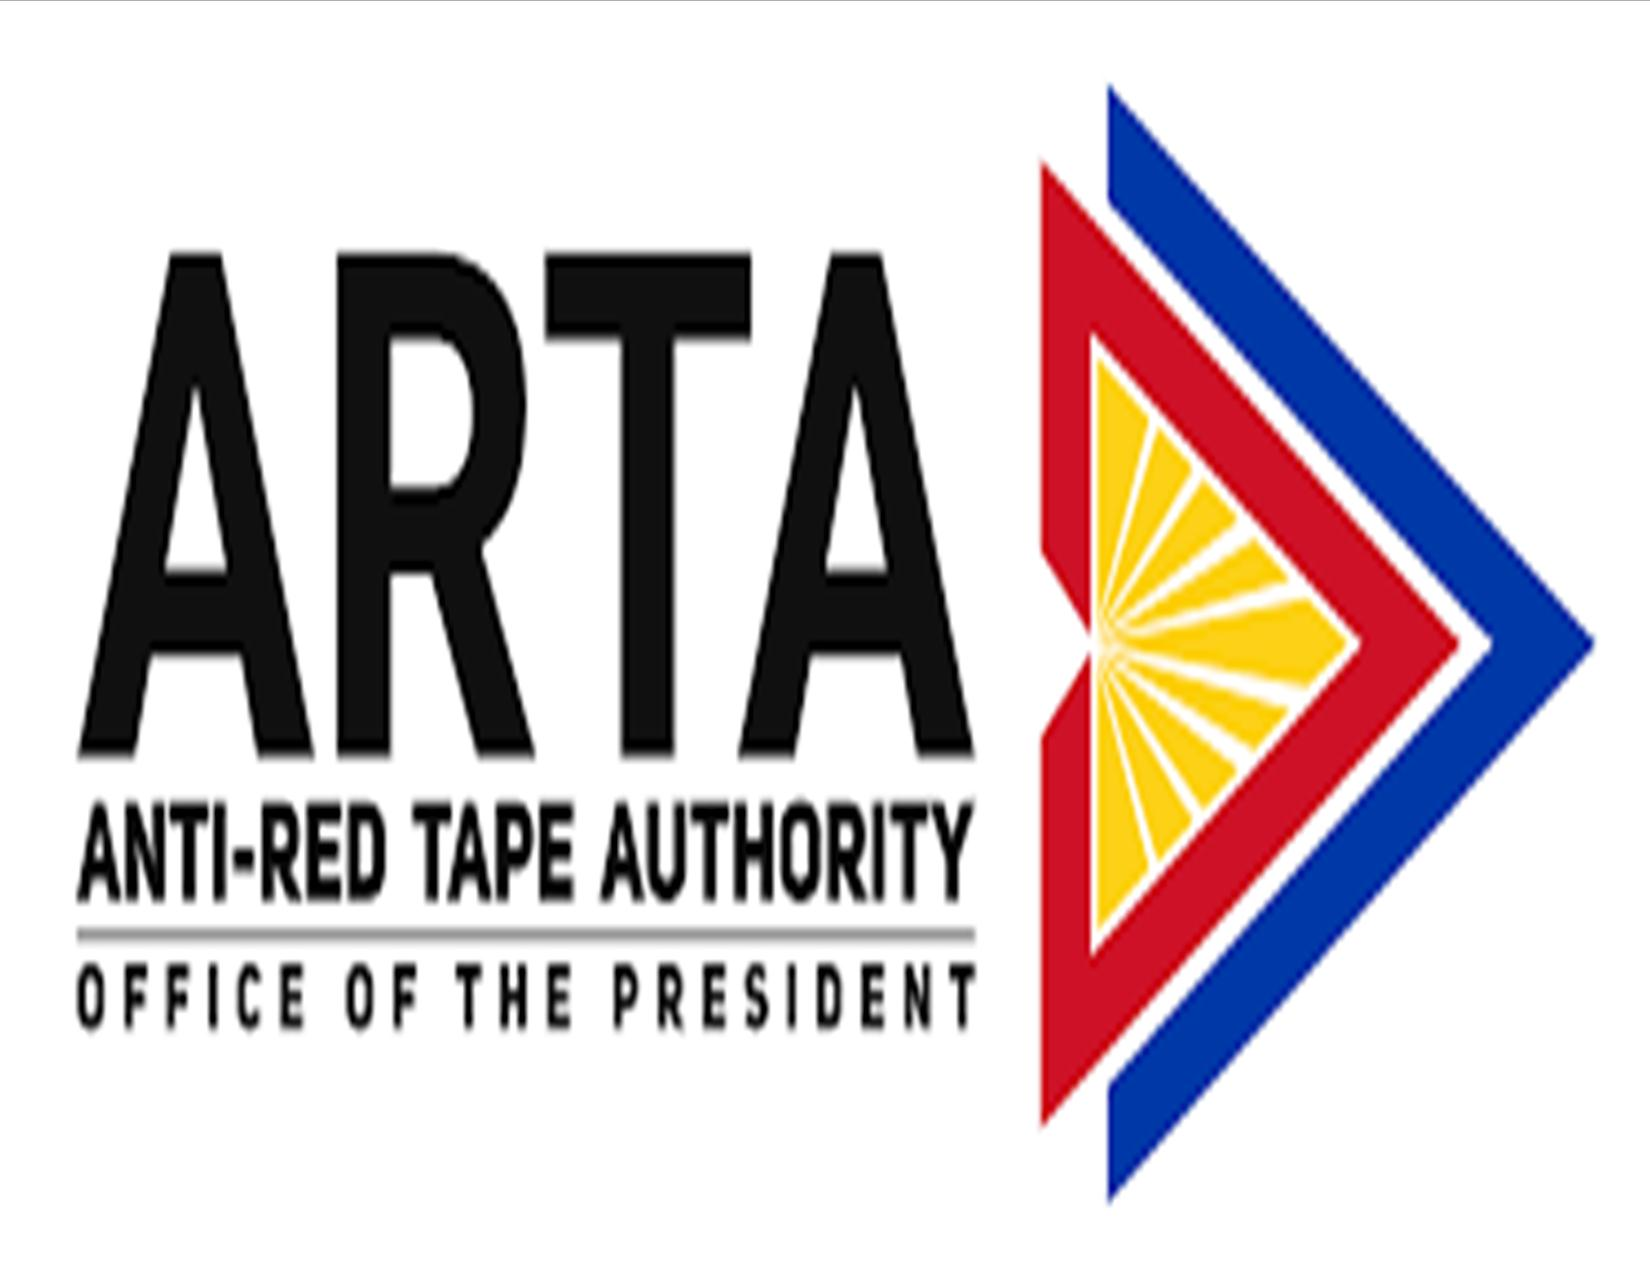 Anti-Red-Tape-Authority-ARTA-2